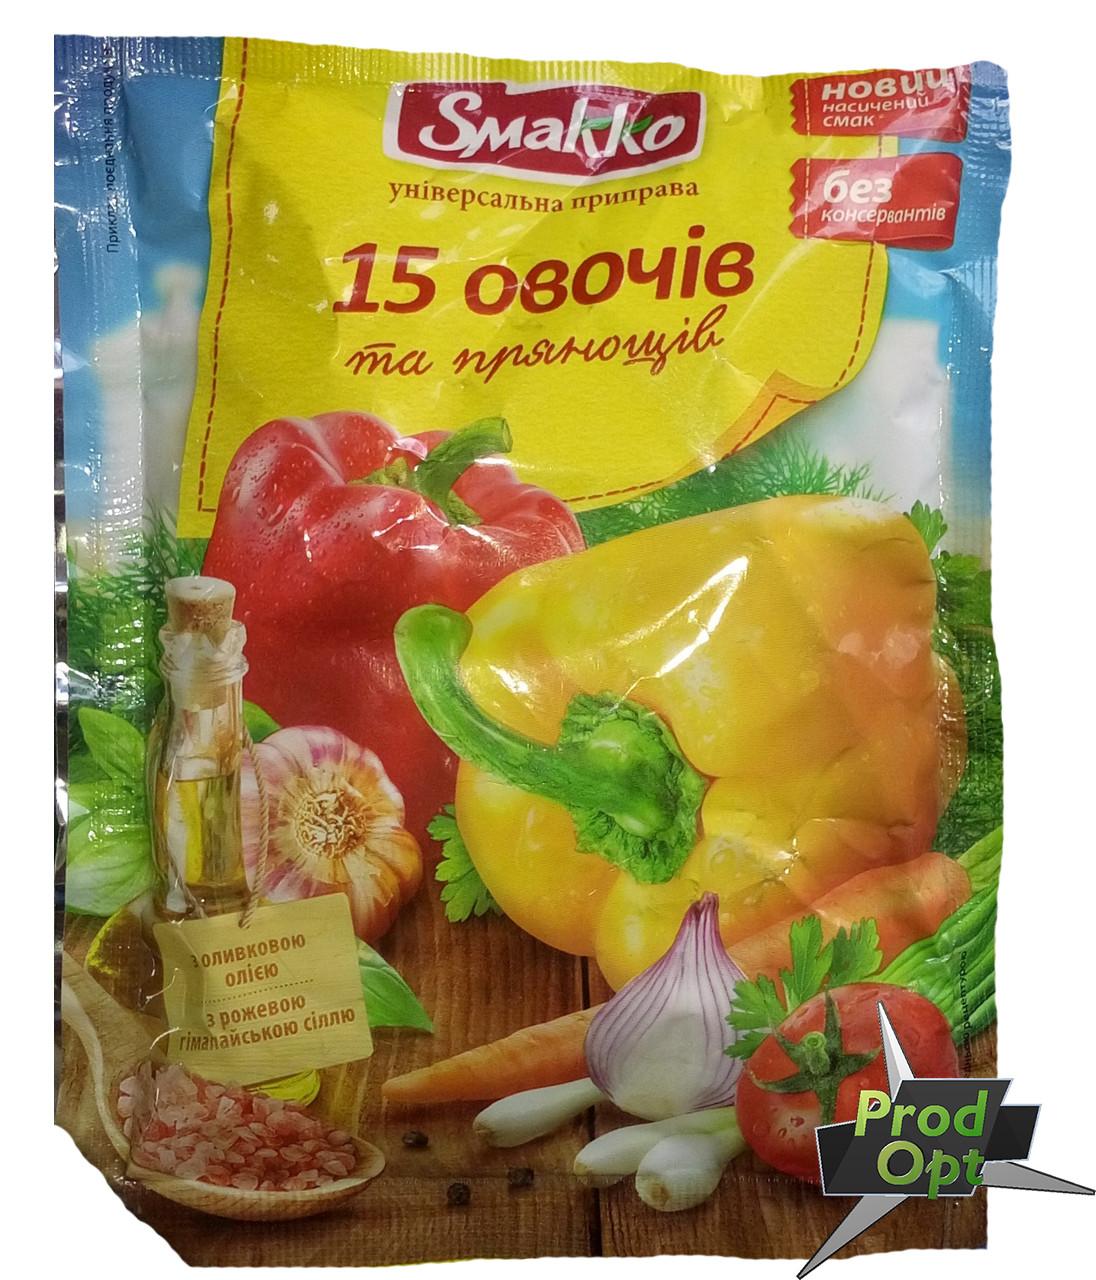 Приправа 15 овочів та пряностей Smakko 70 г